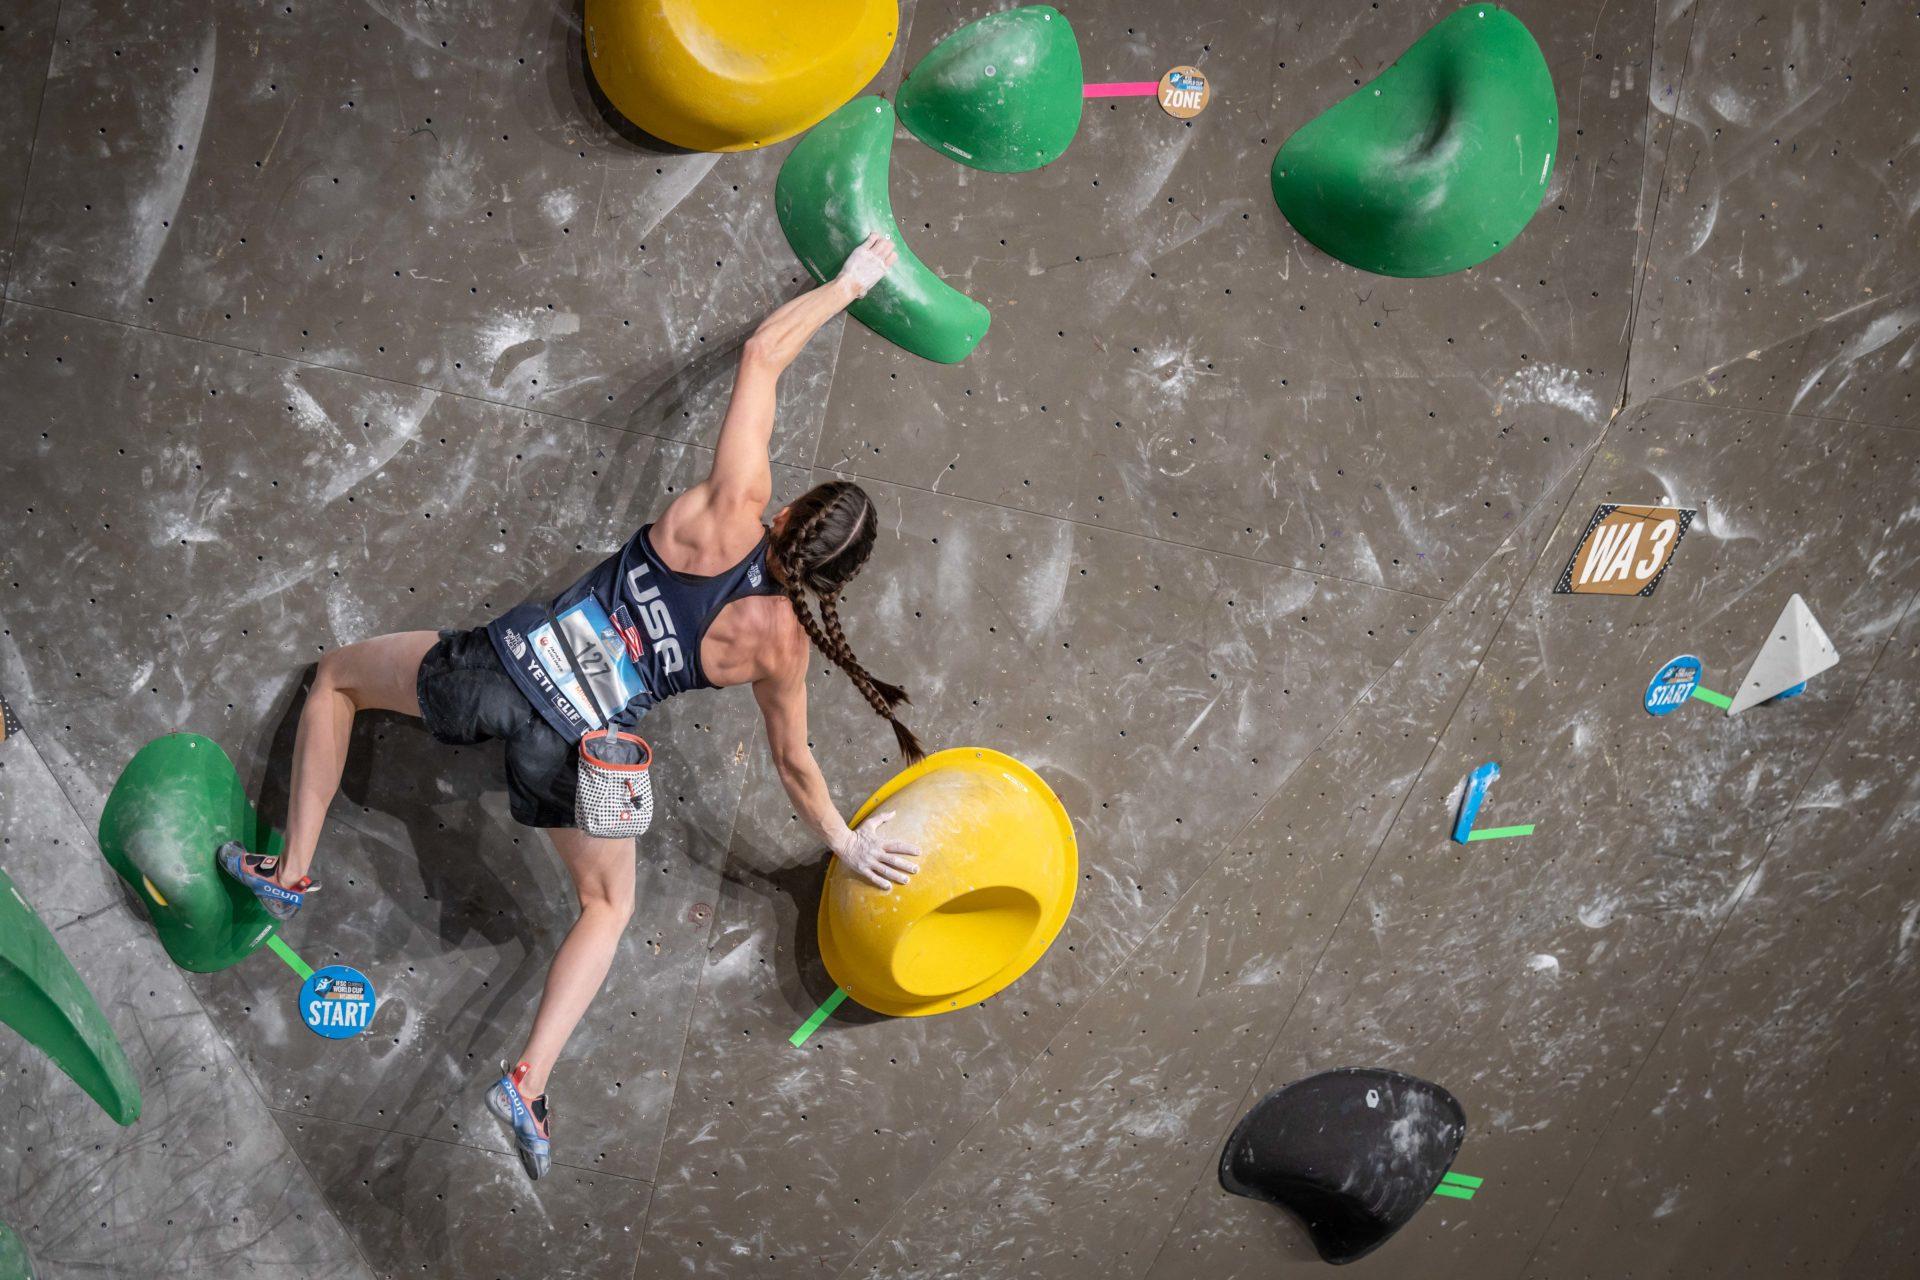 Female USA Climber #127 mid reach on climbing wall